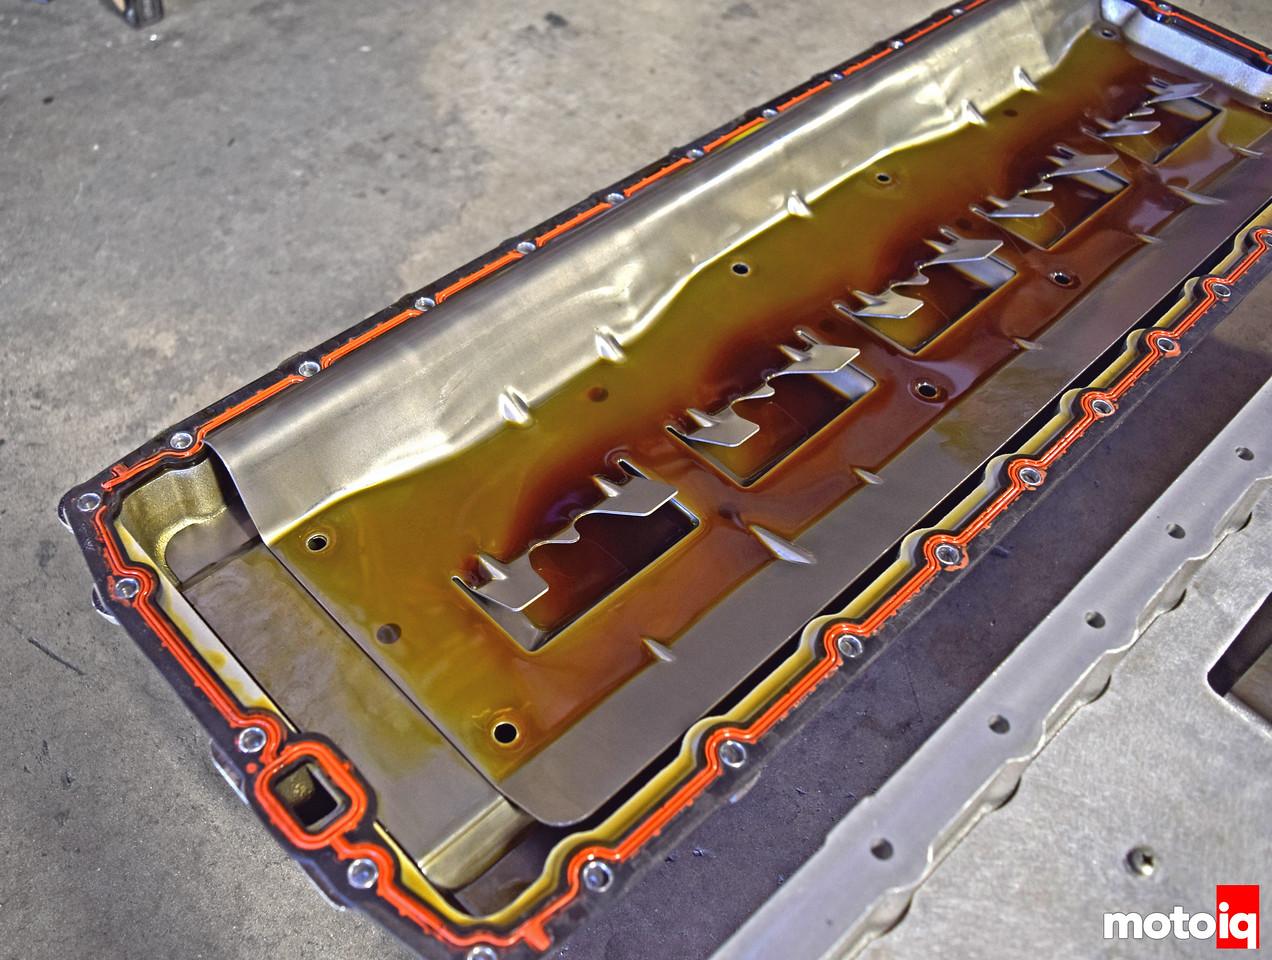 Viper Gen 2 Stock Windage Tray